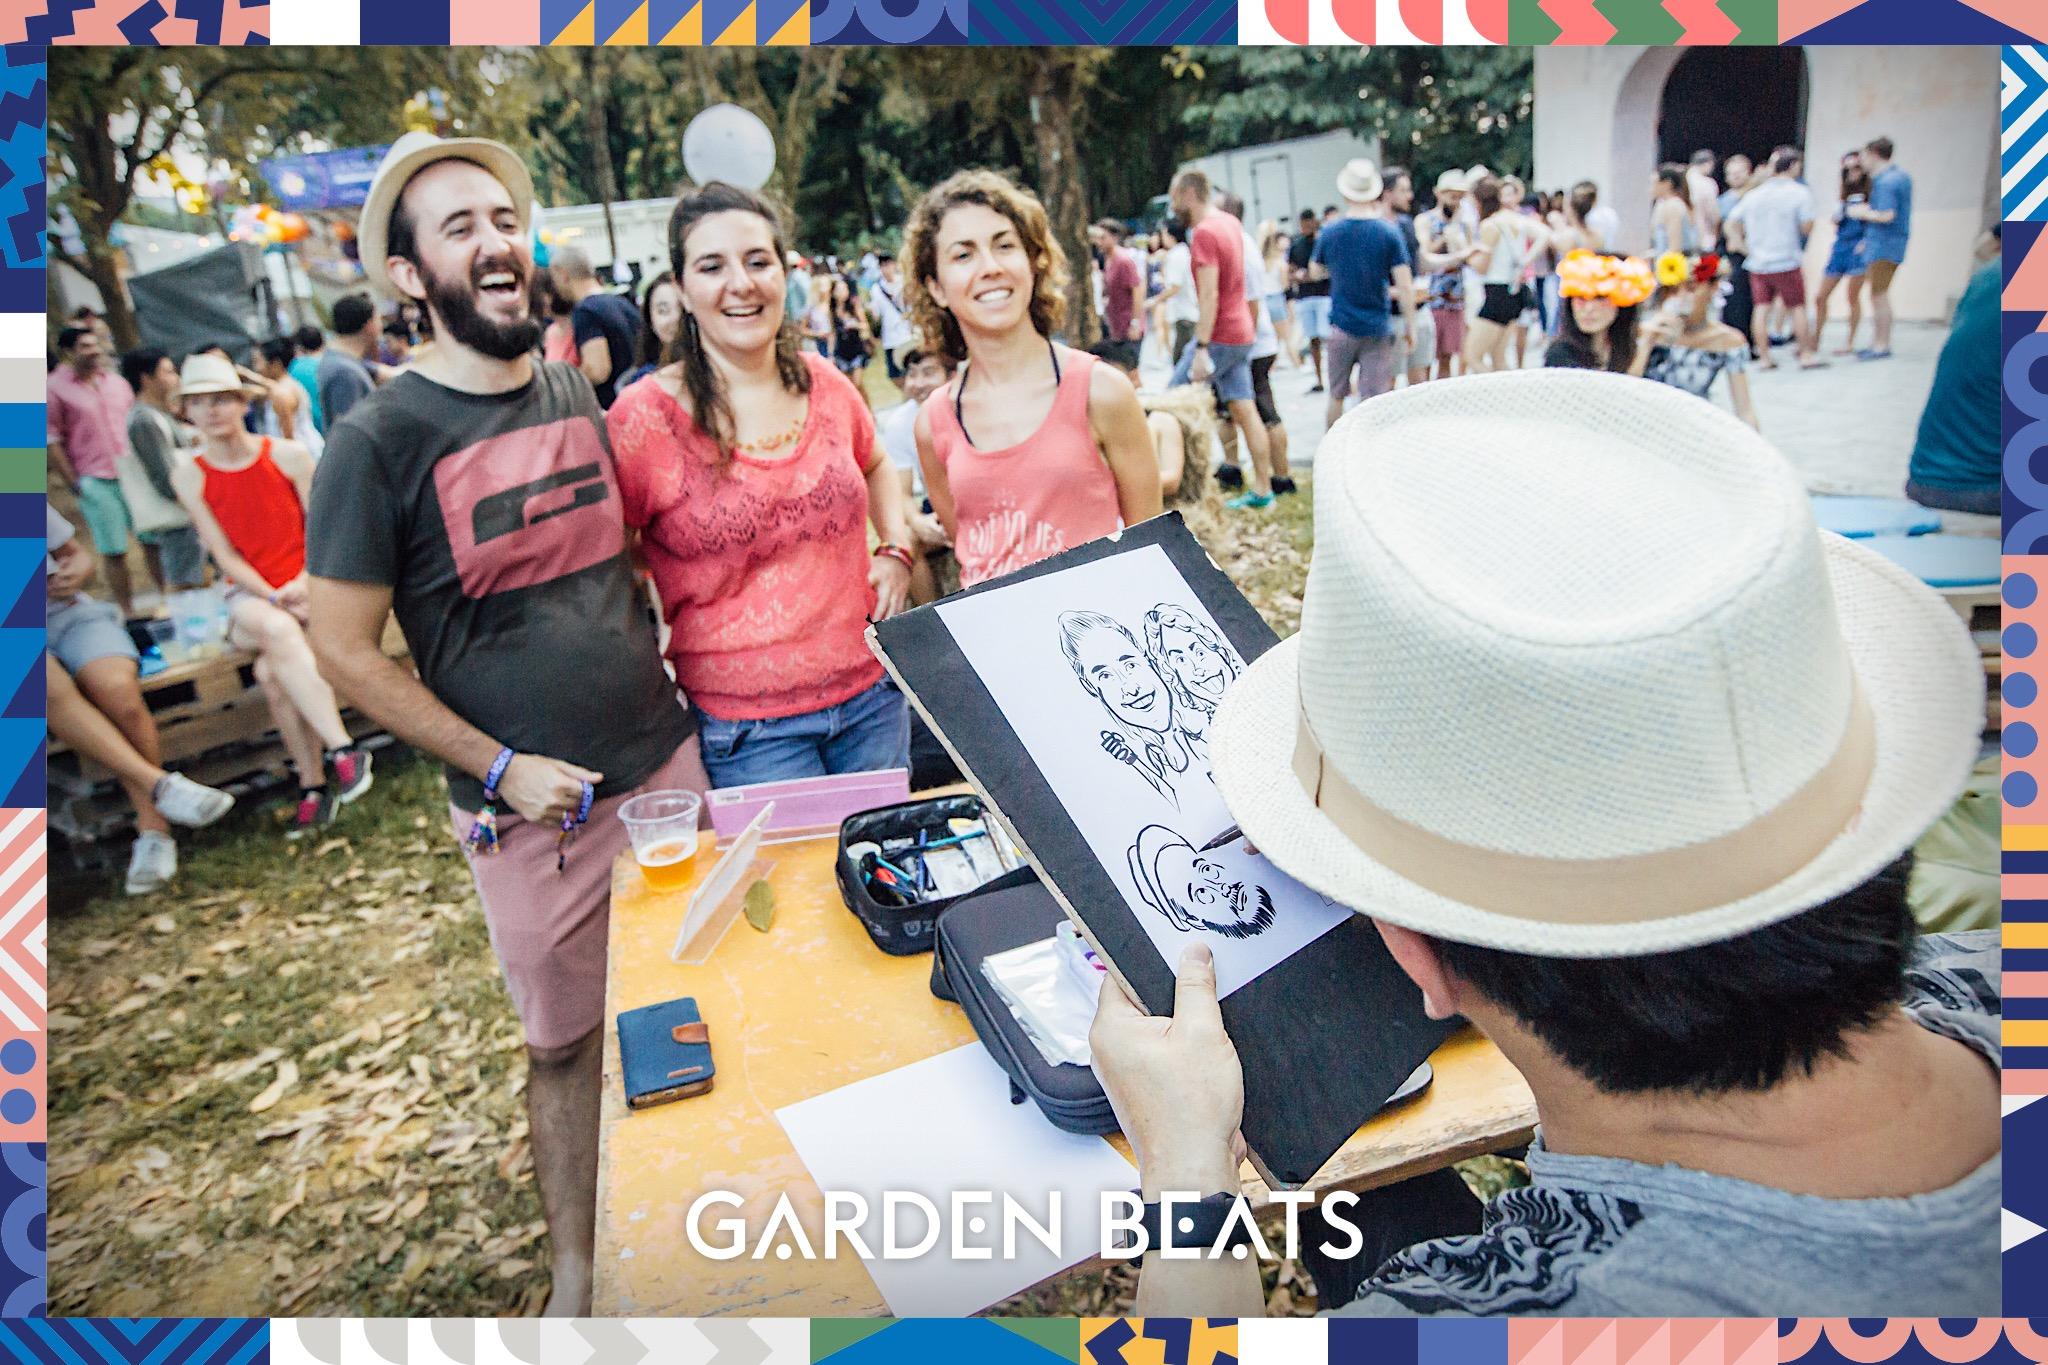 18032017_GardenBeats_Colossal633_WatermarkedGB.jpg